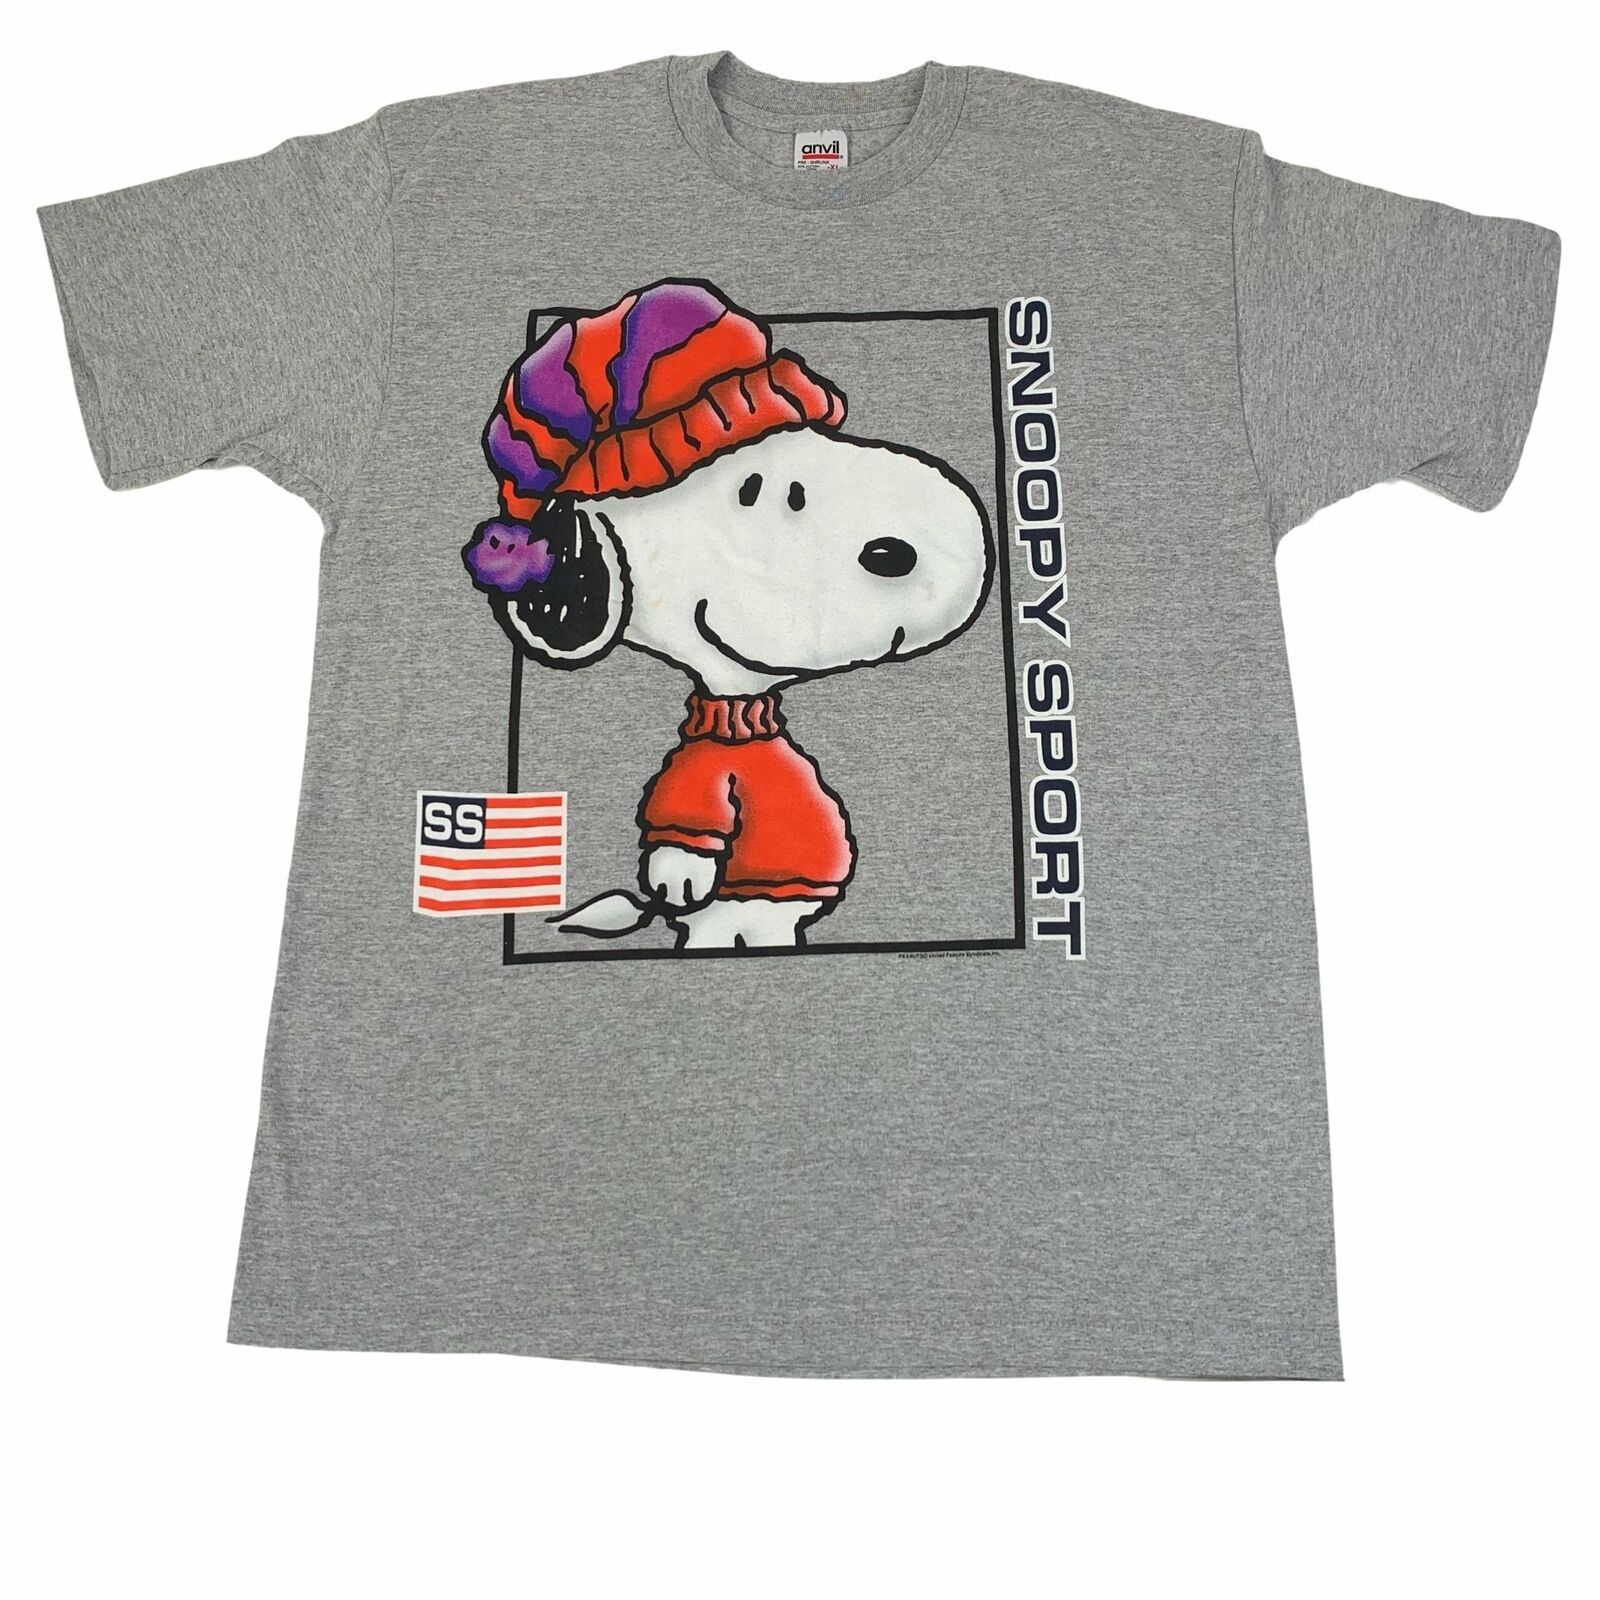 Vintage Peanuts Snoopy Charles Schulz Polo Sport Charlie braun T-hemd